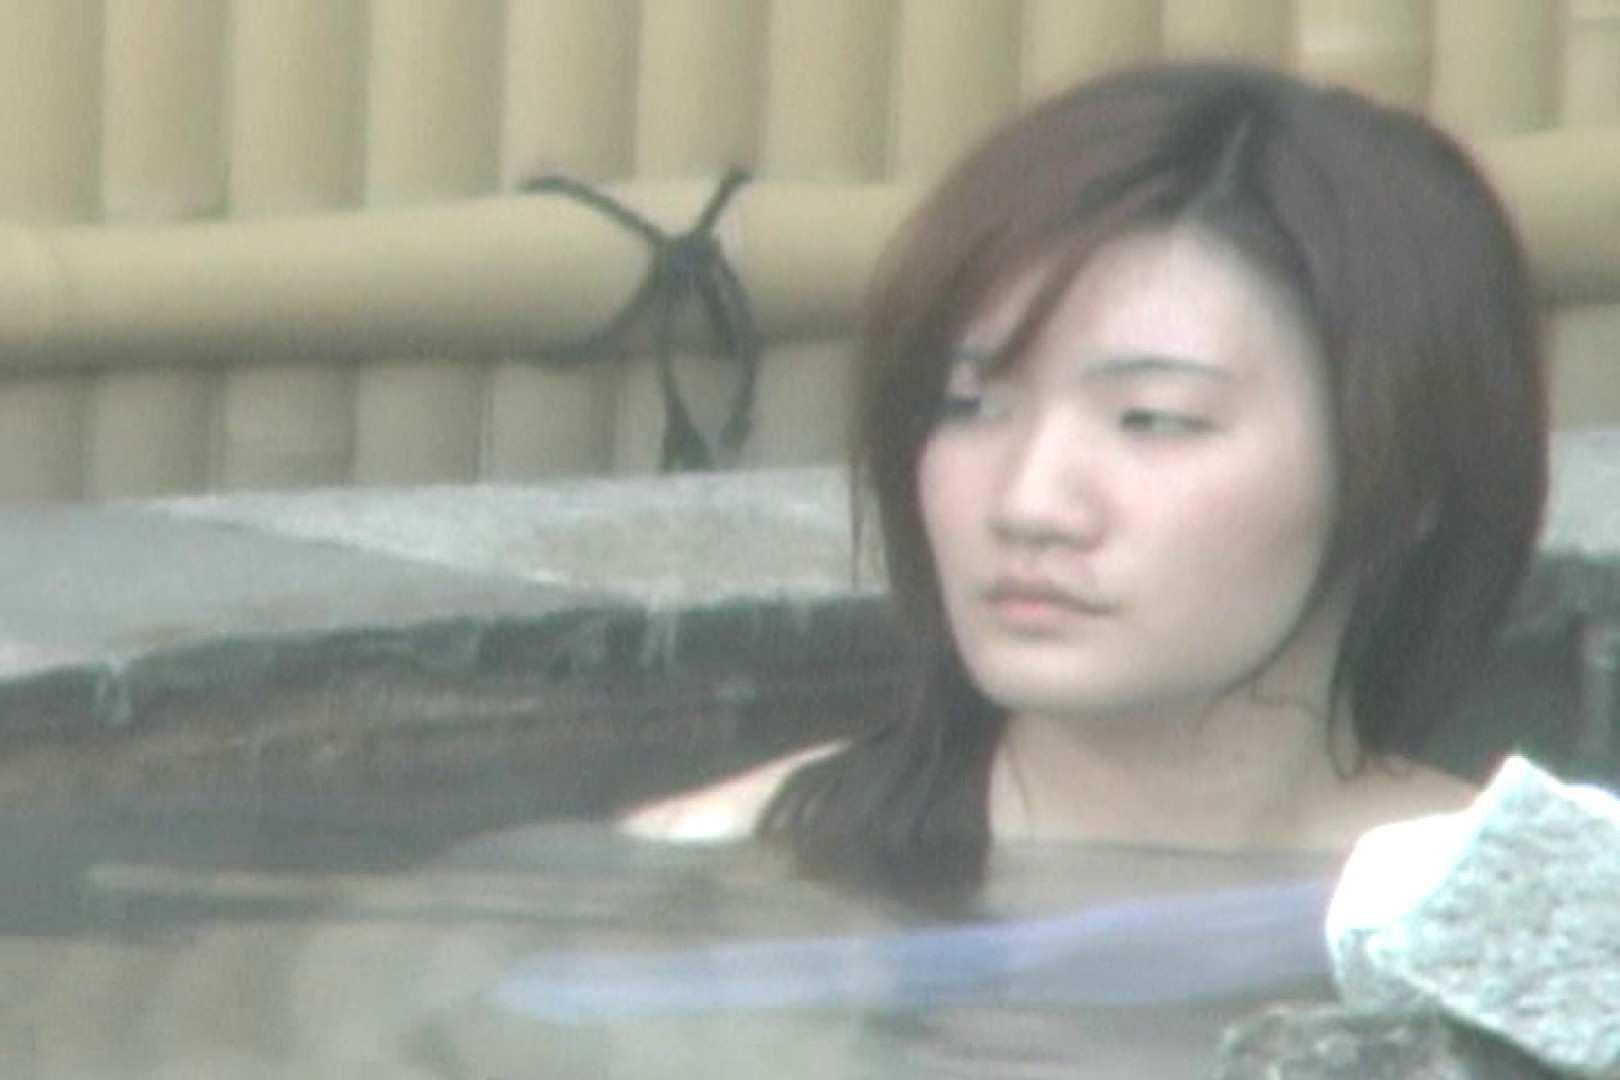 Aquaな露天風呂Vol.590 露天風呂突入 すけべAV動画紹介 76pic 44